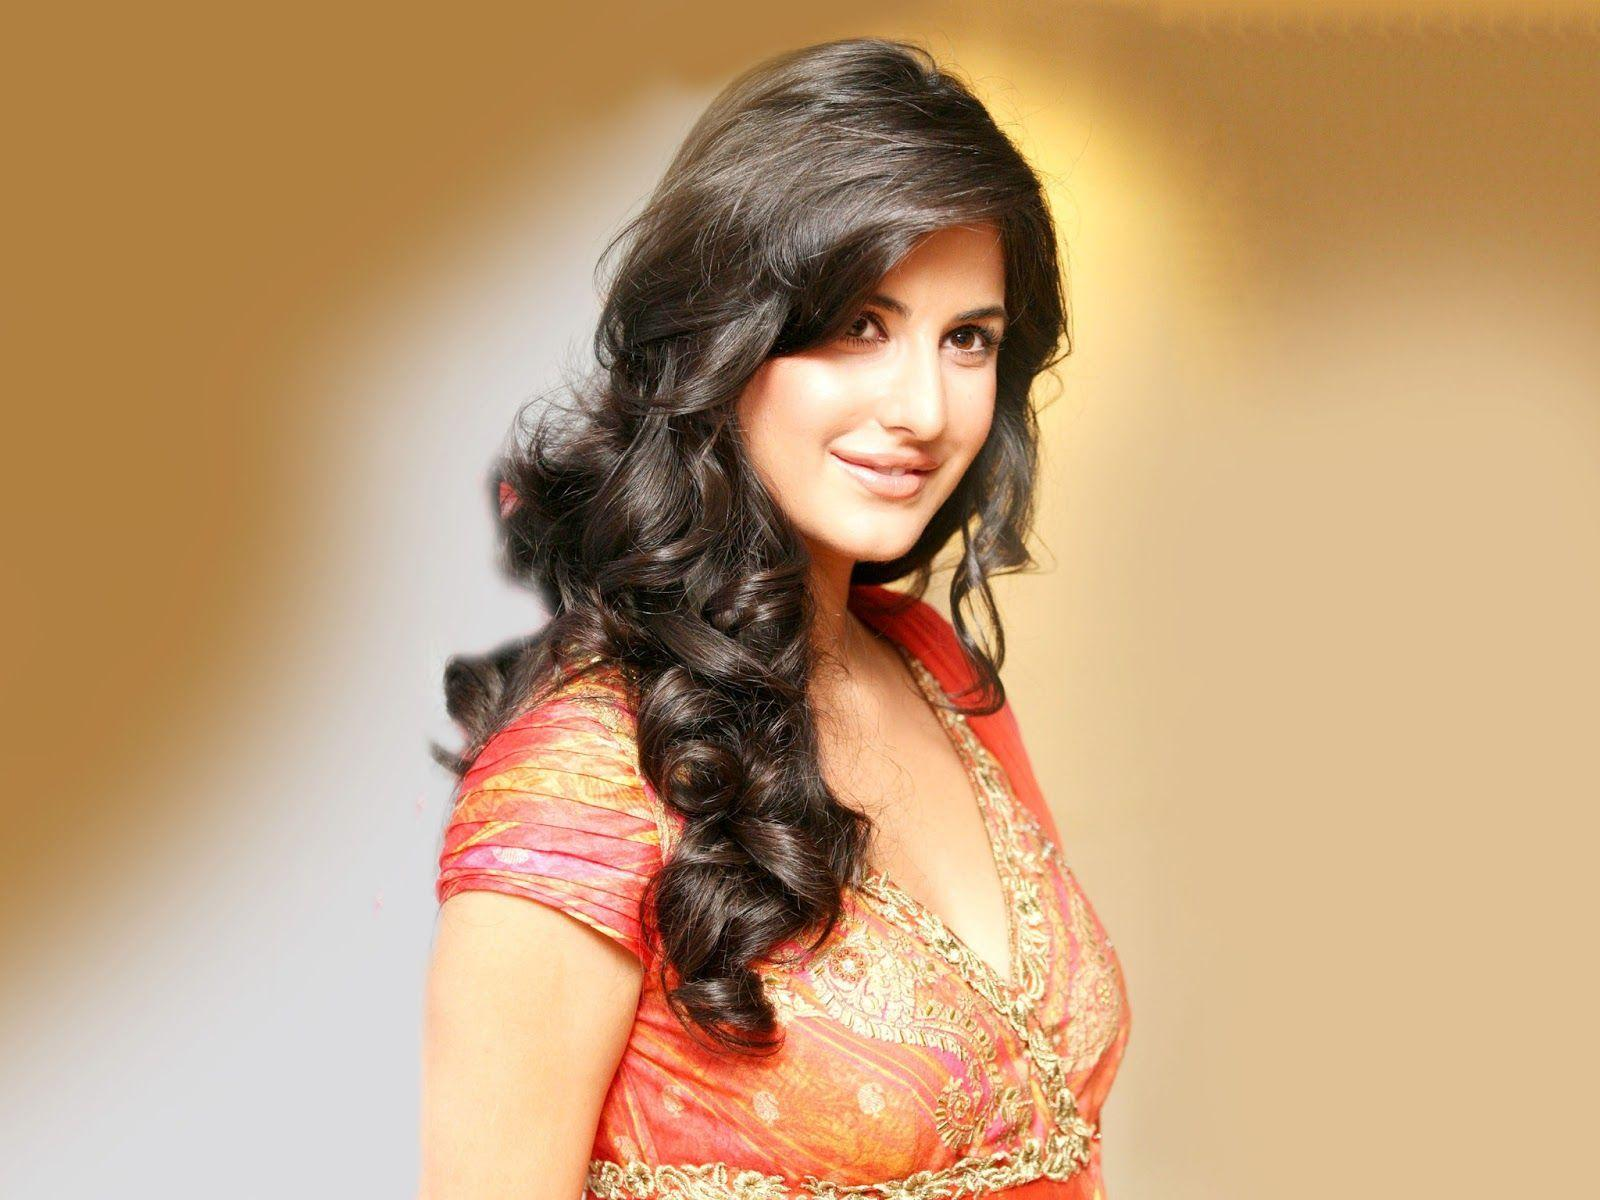 bollywood actress wallpapers - photo #11